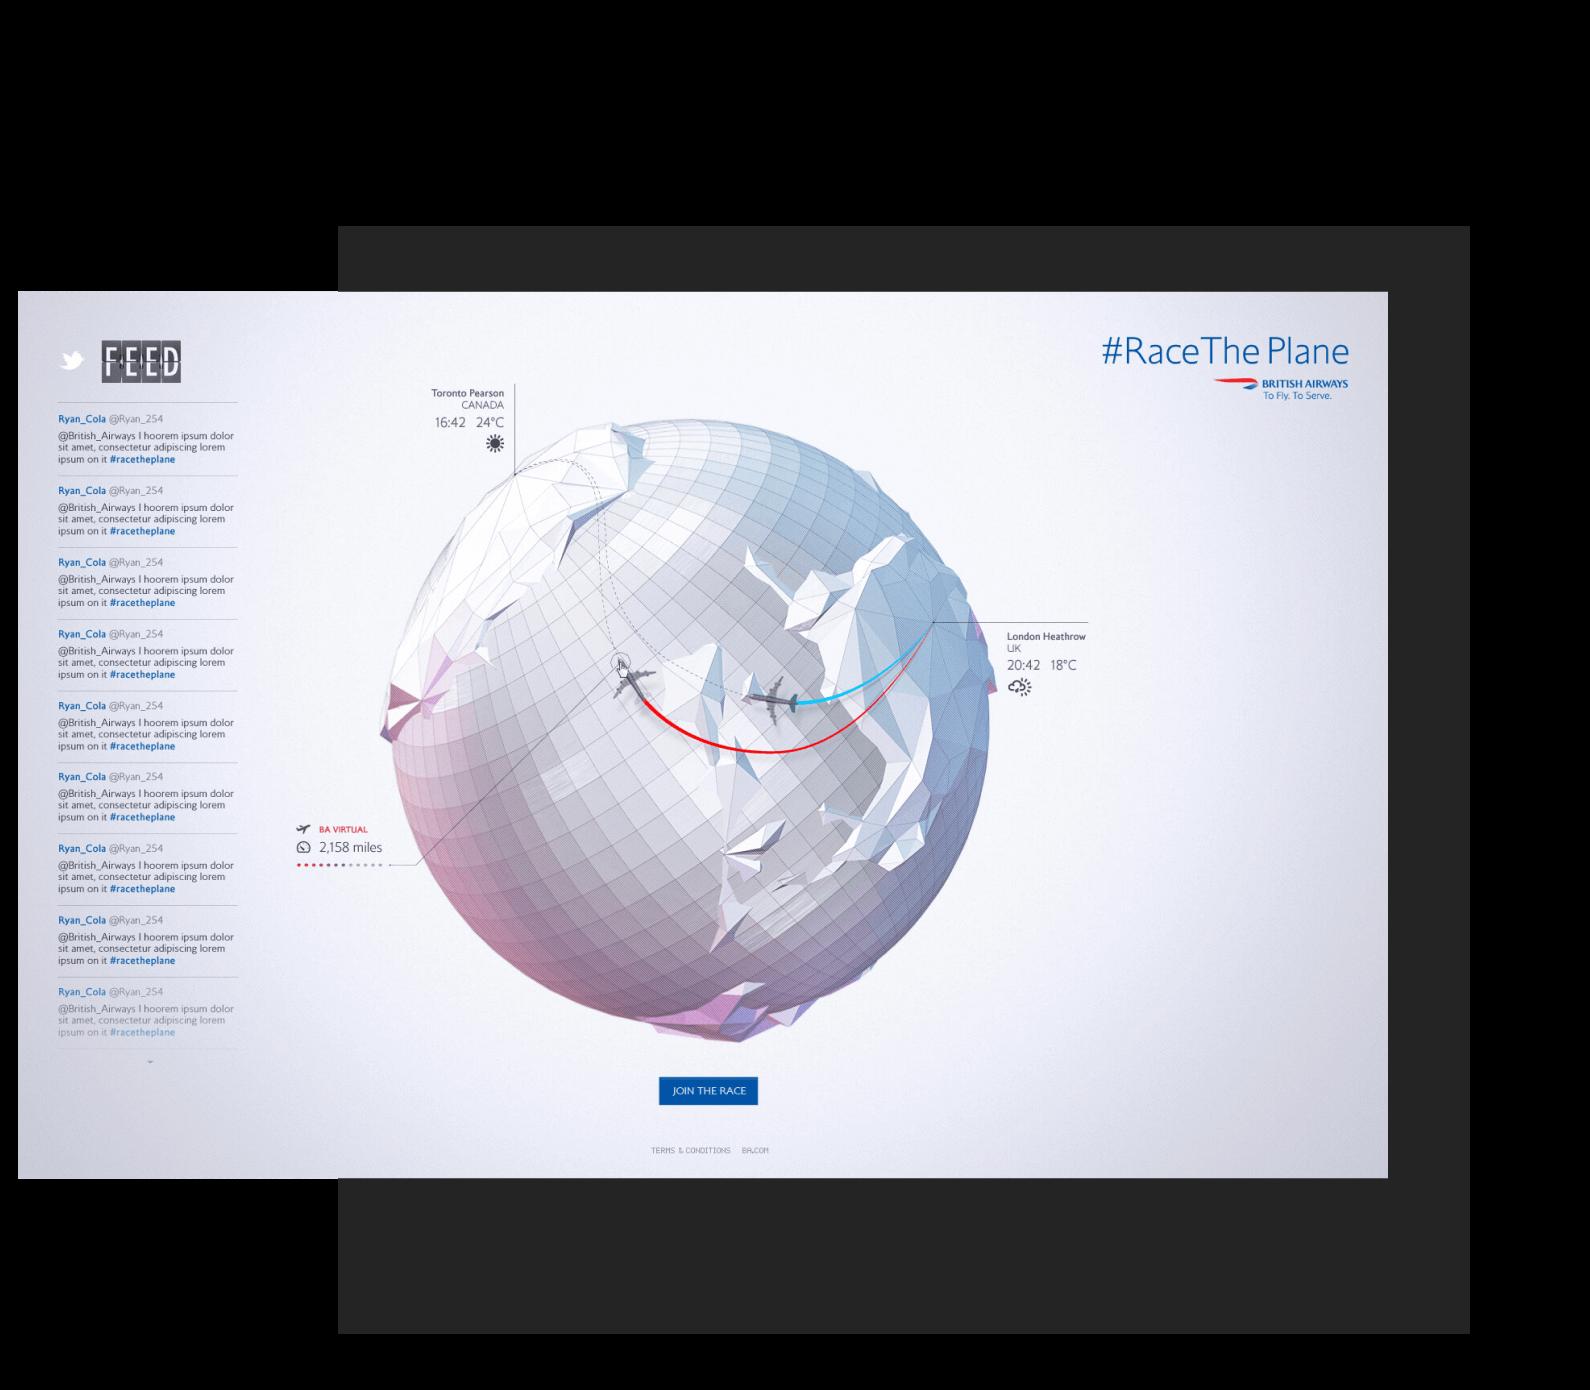 australia-website-design-agency-space-66